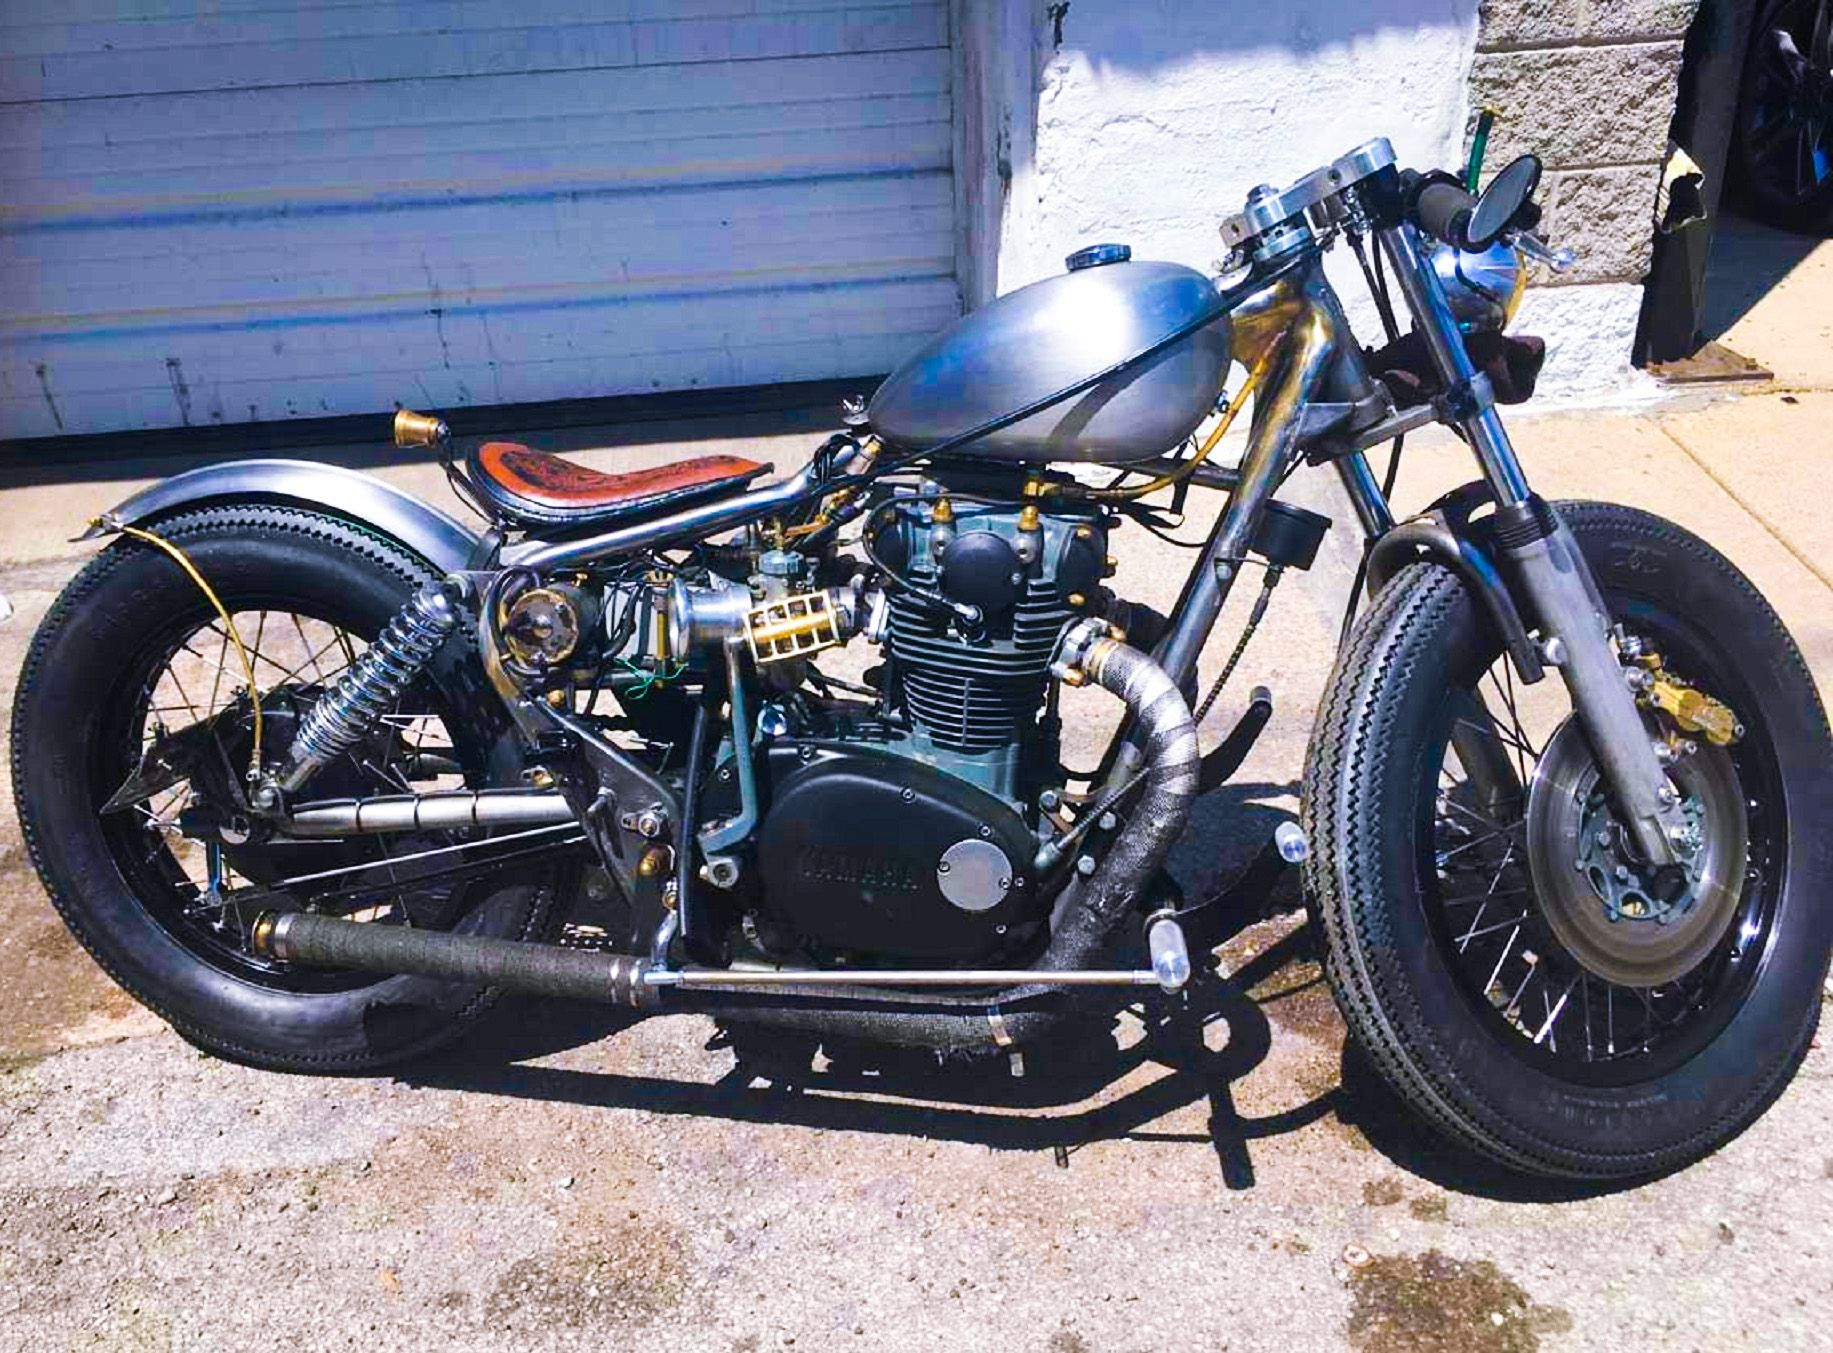 hight resolution of 1976 yamaha xs650 brat style bobber http xs650chopper com 2016